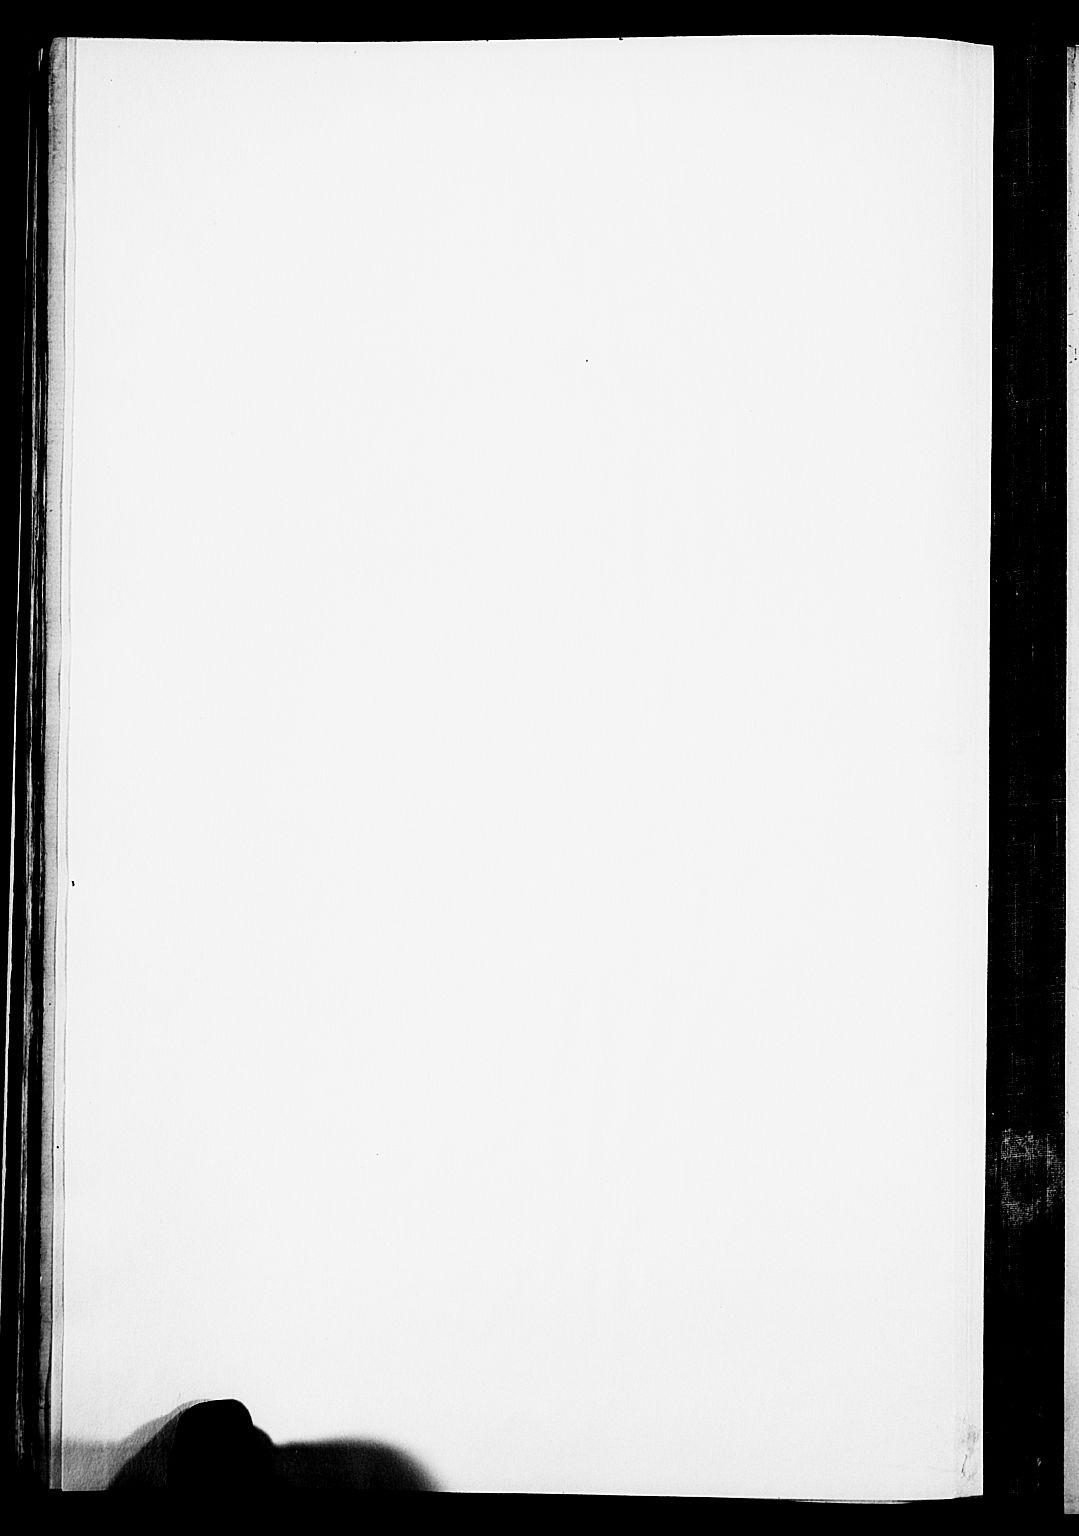 SAH, Vågå prestekontor, Ministerialbok nr. 10, 1887-1904